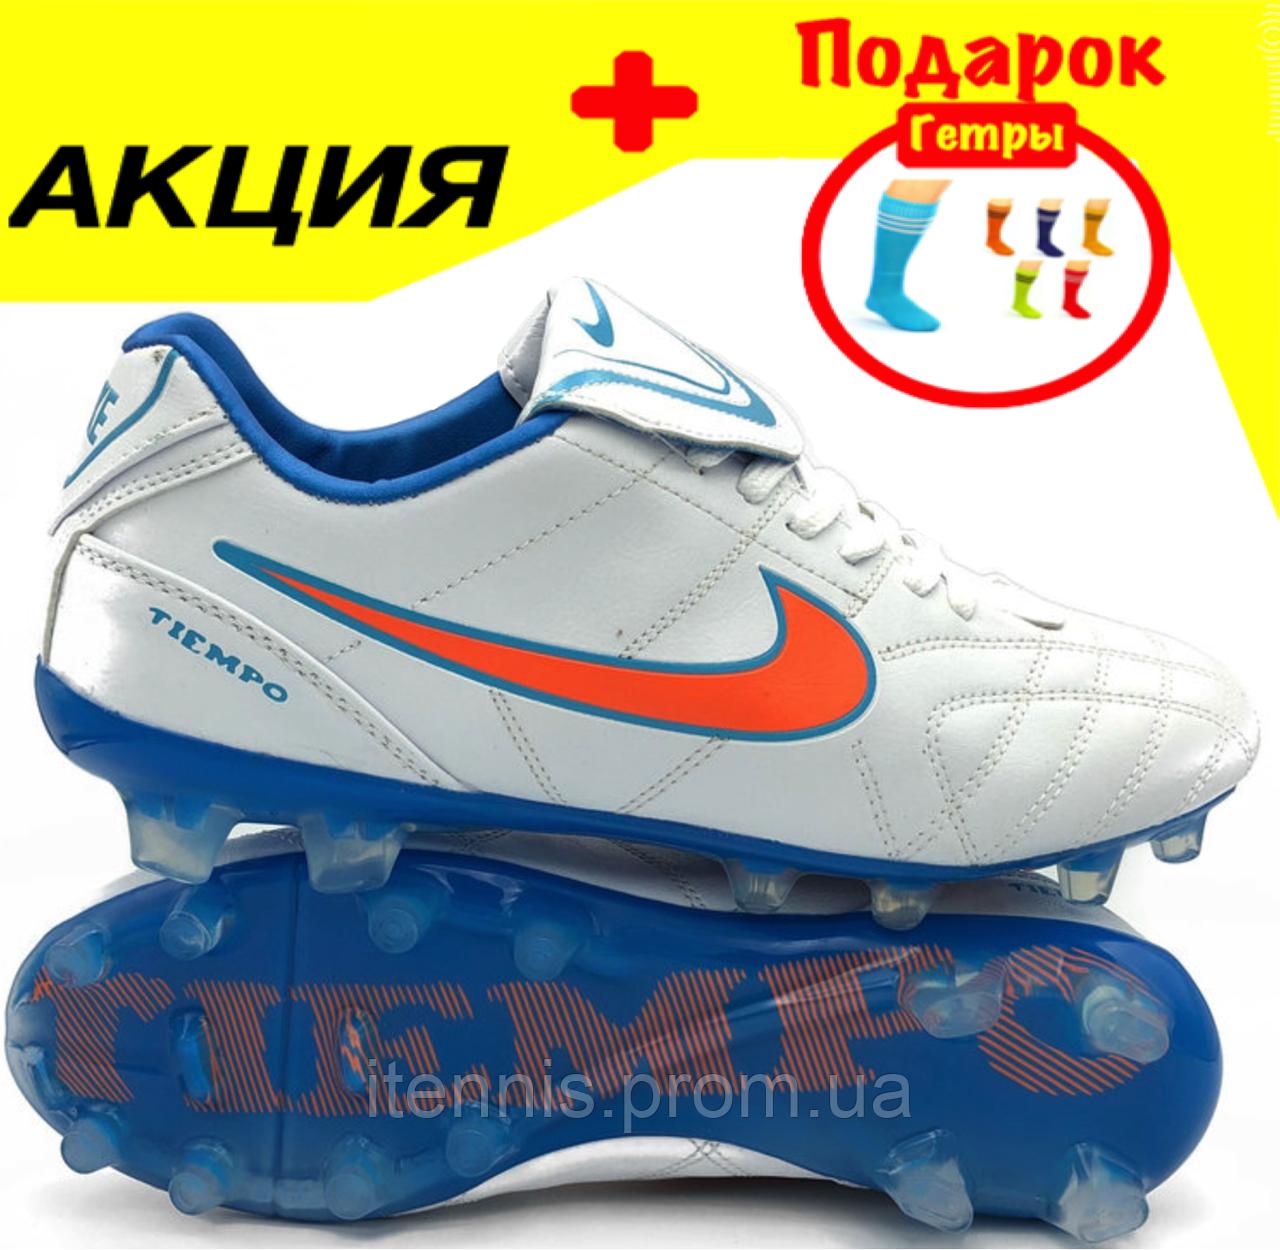 Футбольные бутсы Nike TIEMPO (р.40-44) NEW U-007T-5